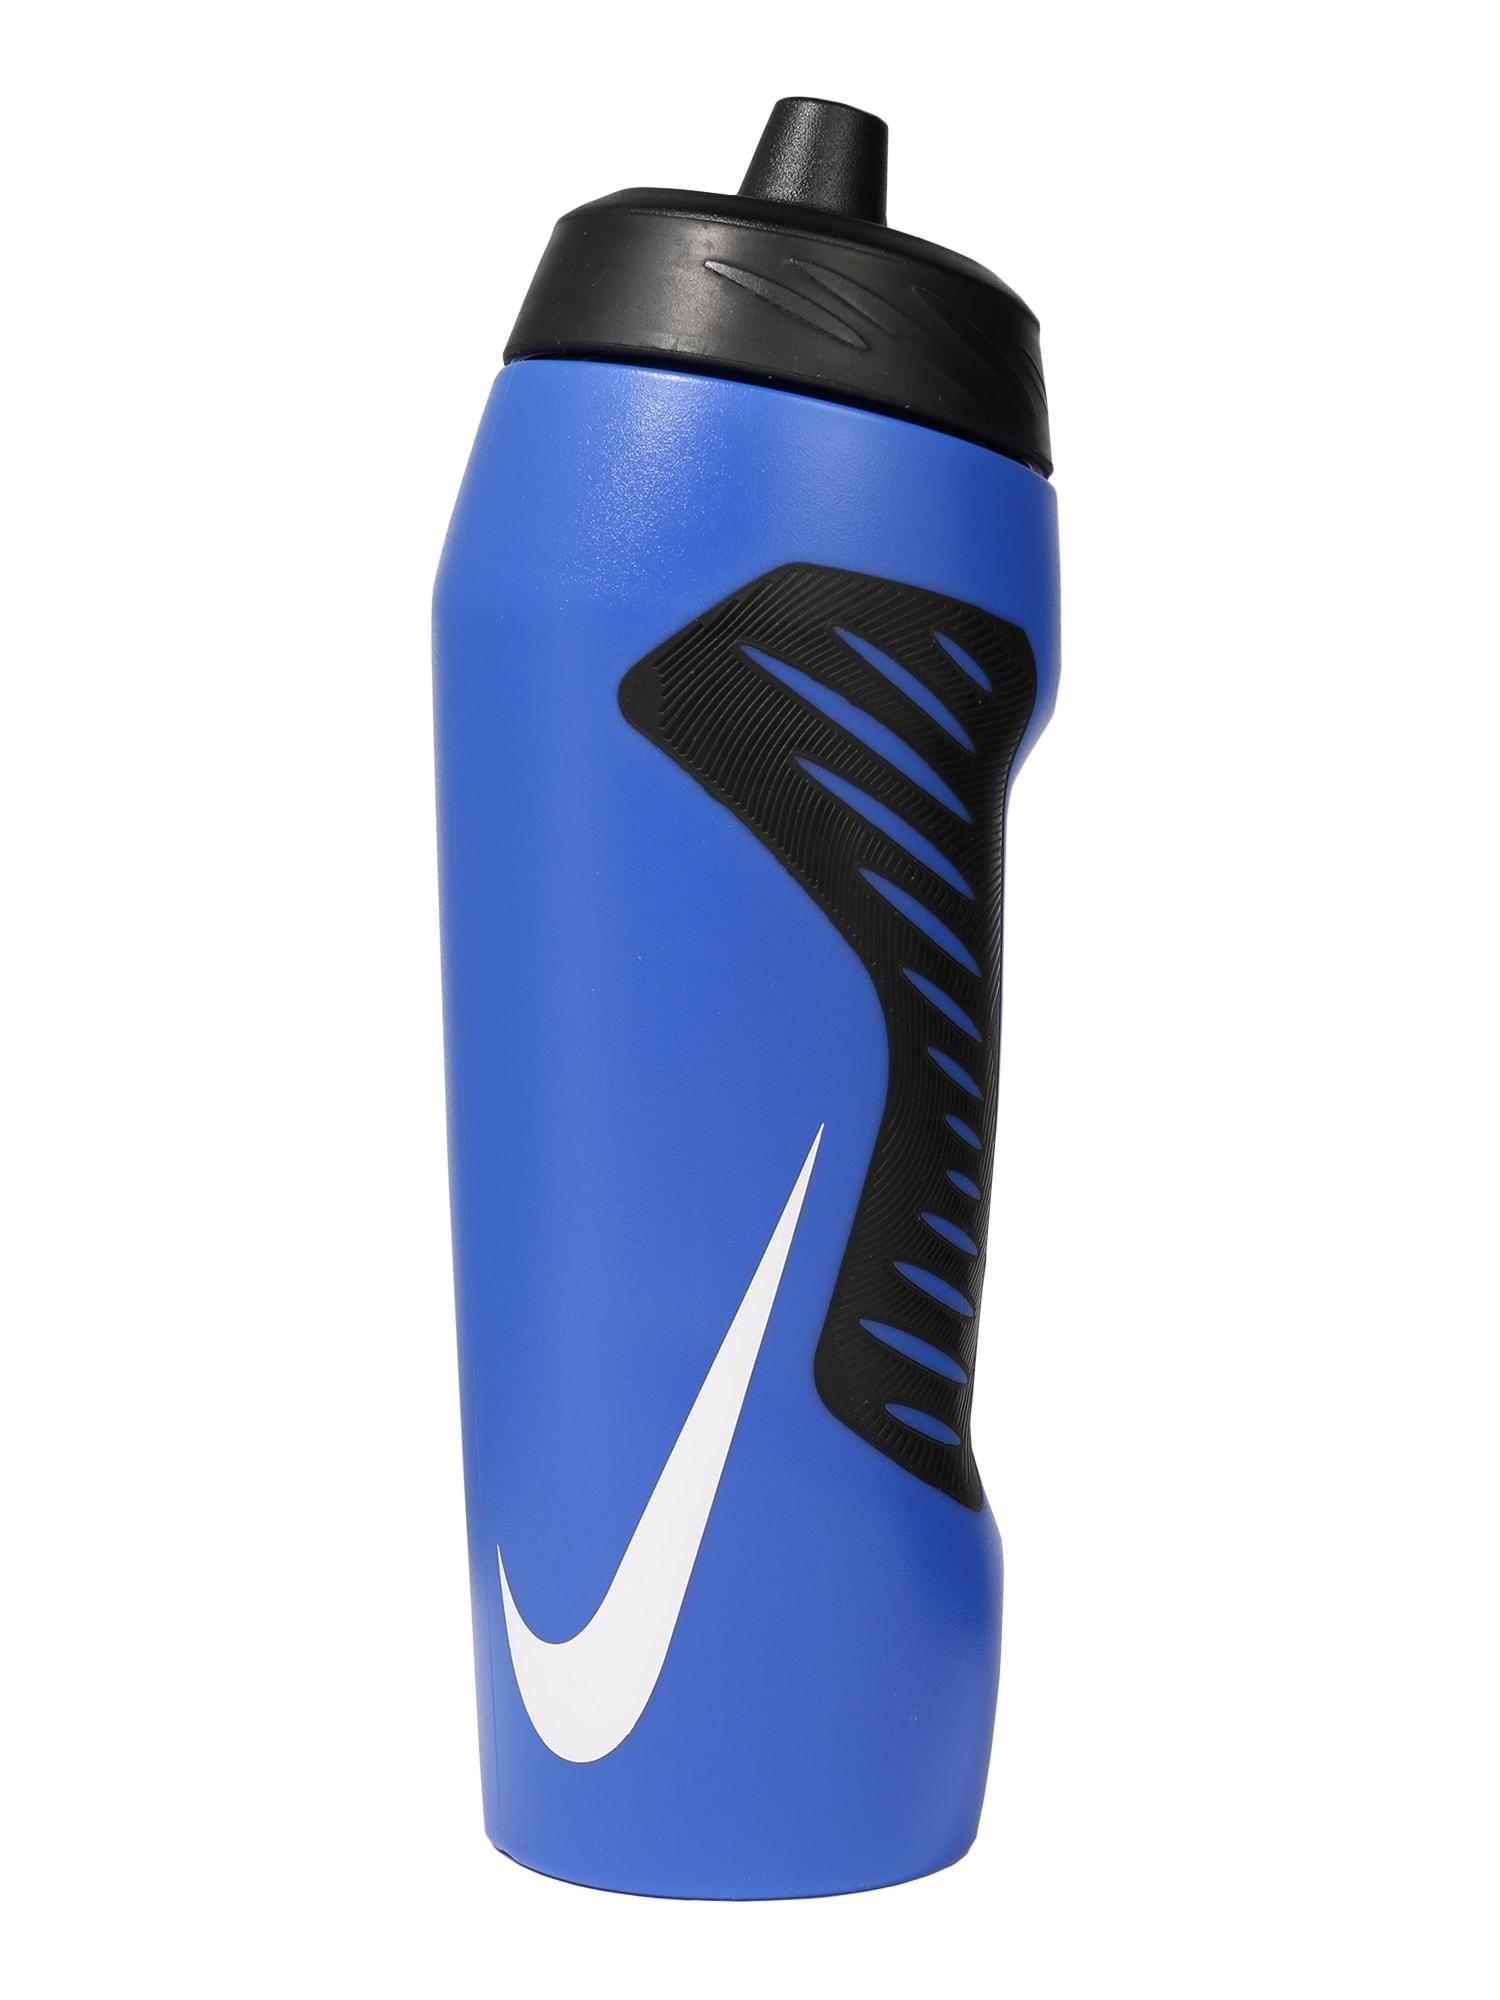 NIKE Accessoires Fľaša na vodu 'Hyperfuel Water Bottle 24oz (709 ml)'  tmavomodrá